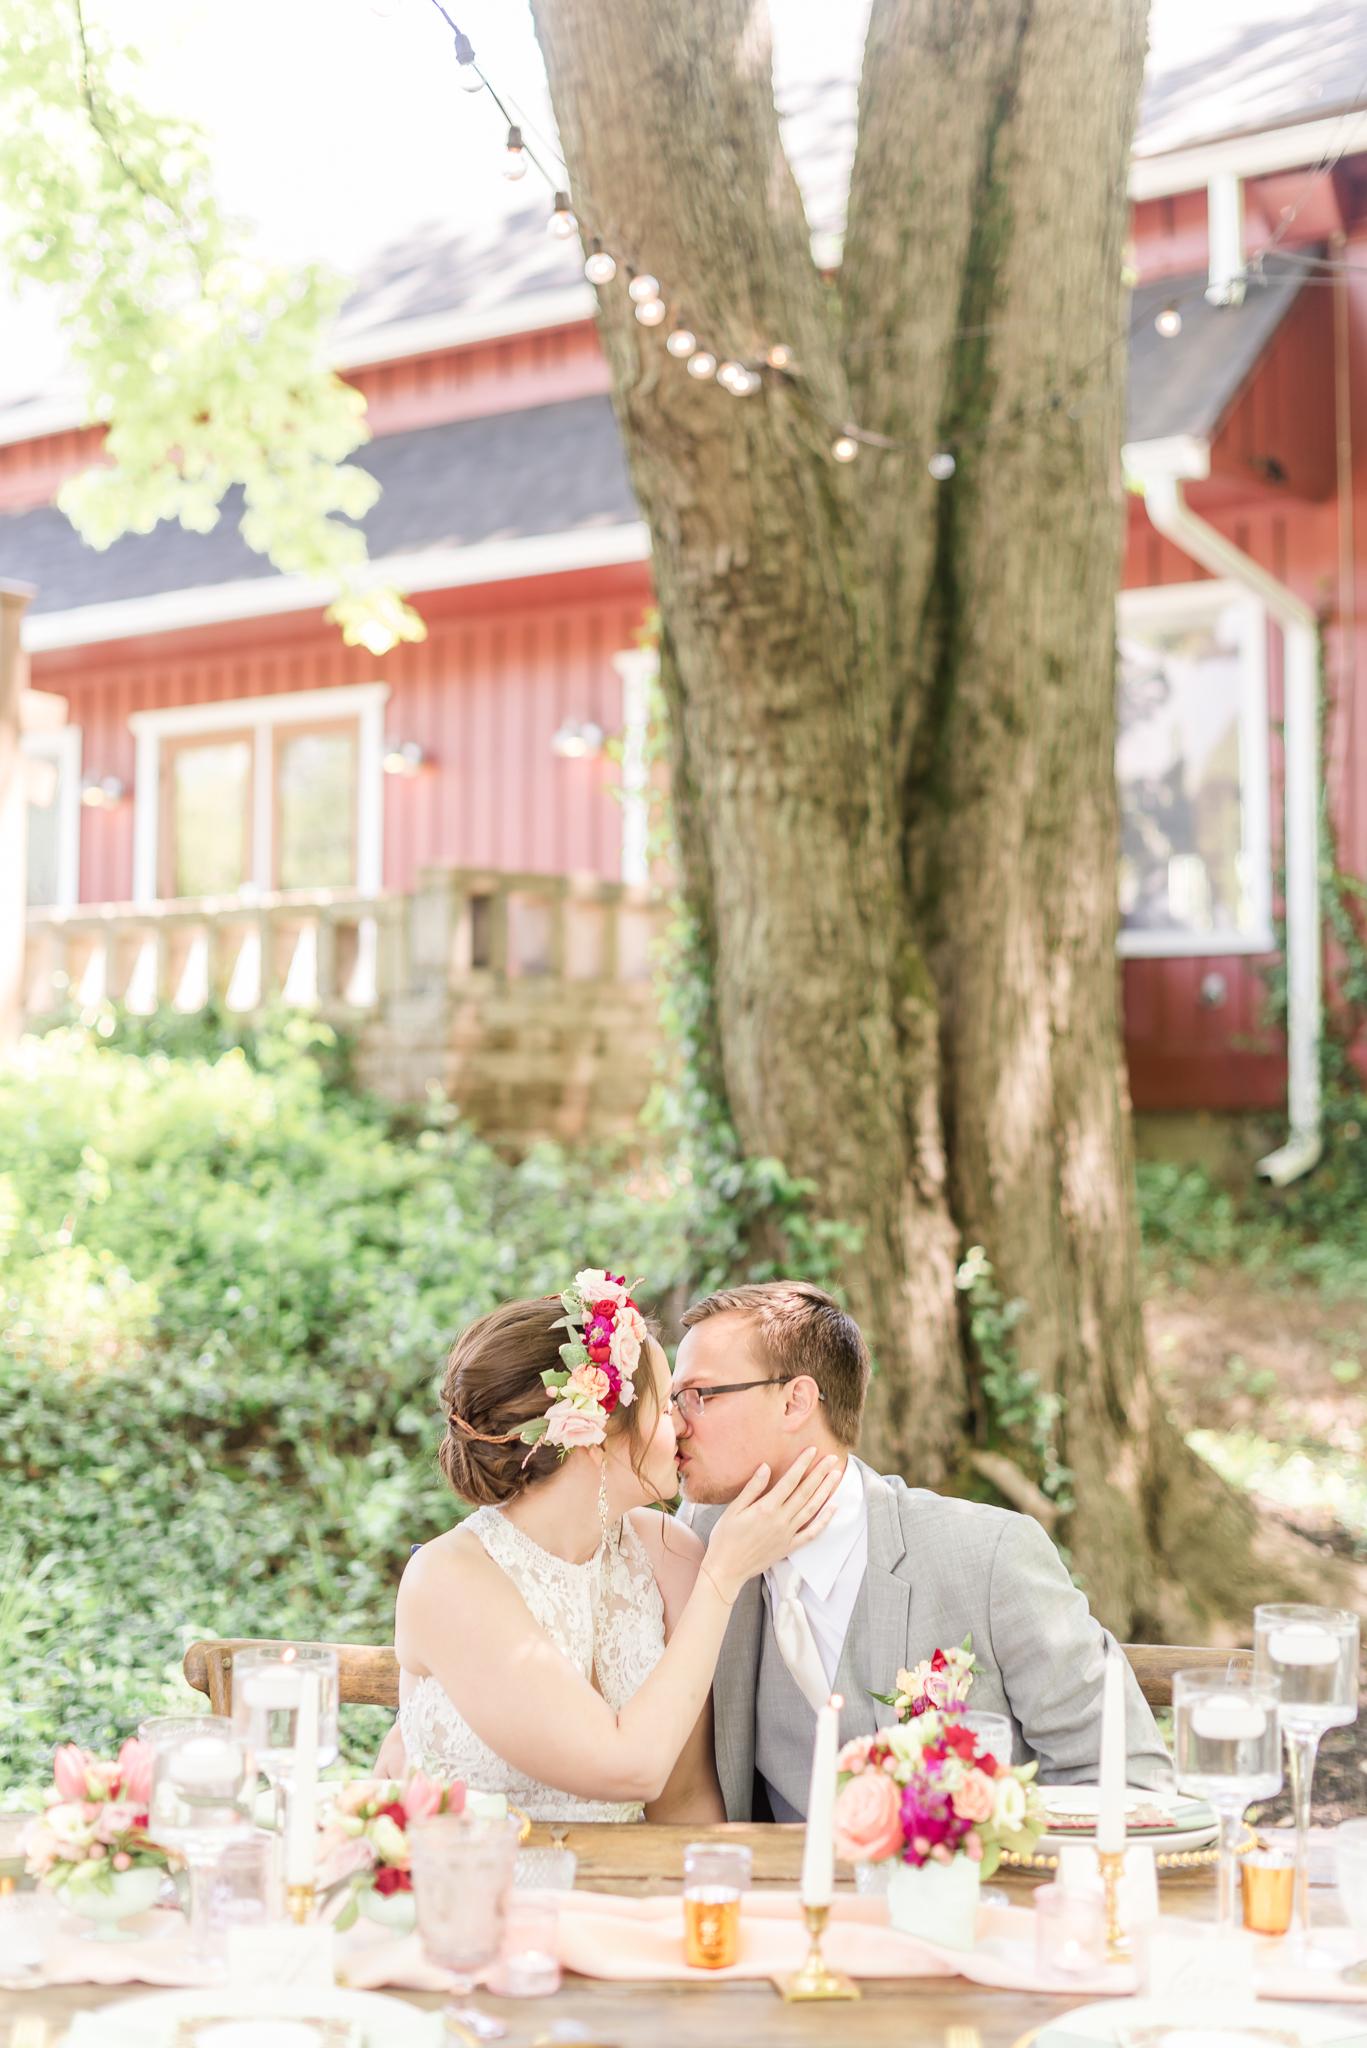 Mustard Seed Gardens Wedding Indianapolis Noblesvile Fishers Wedding Photographer-65.jpg